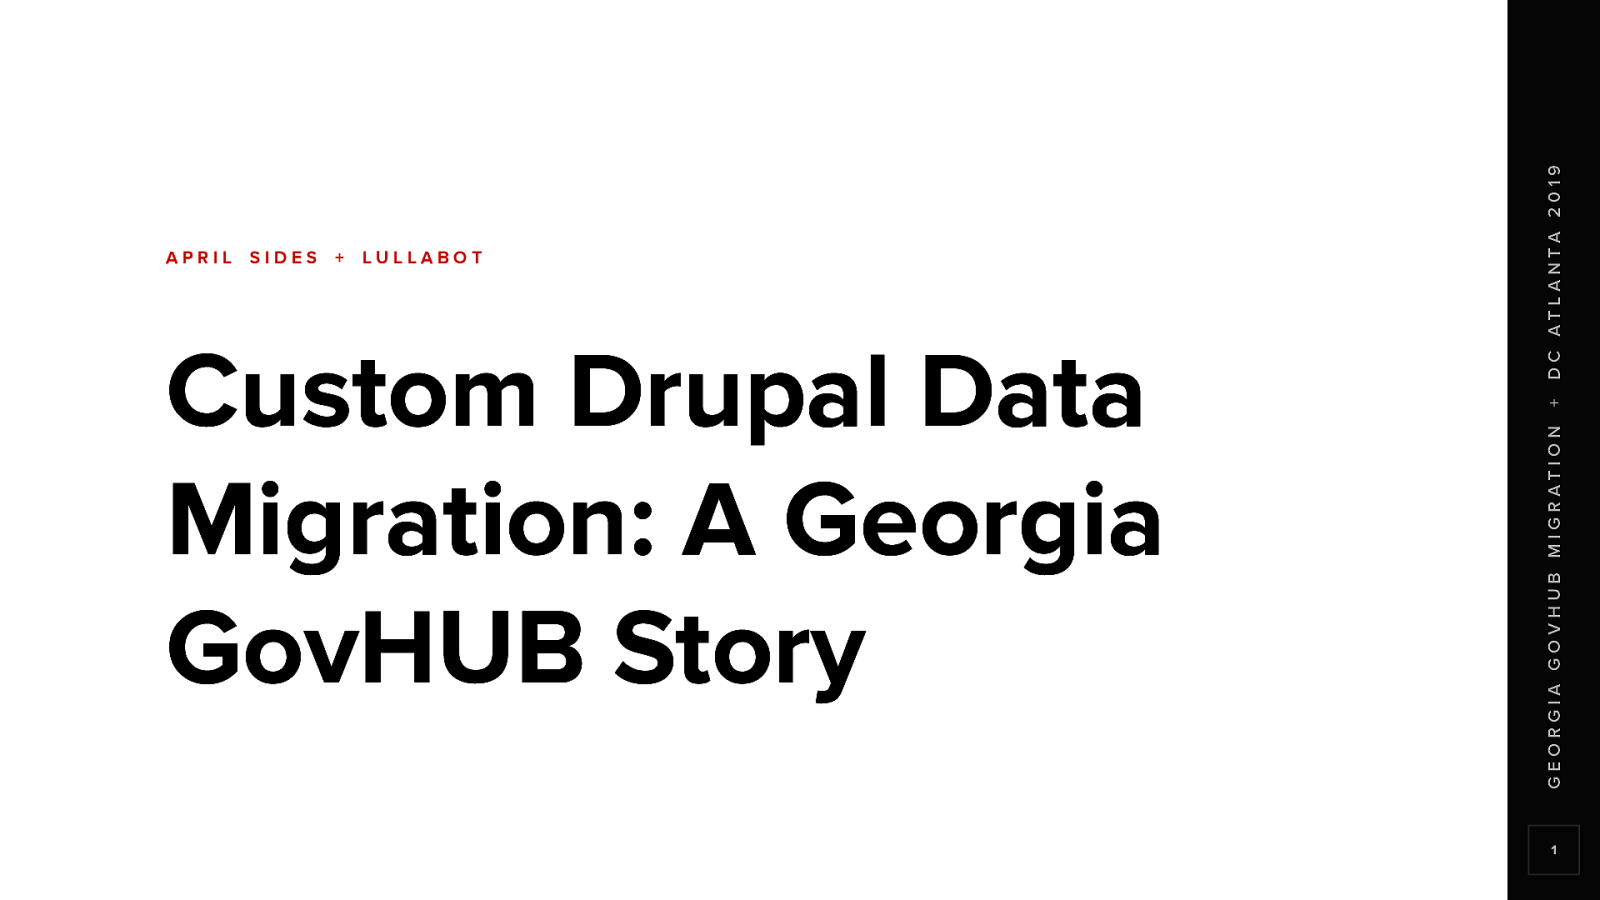 Custom Drupal Data Migration: A Georgia GovHUB Story by April Sides